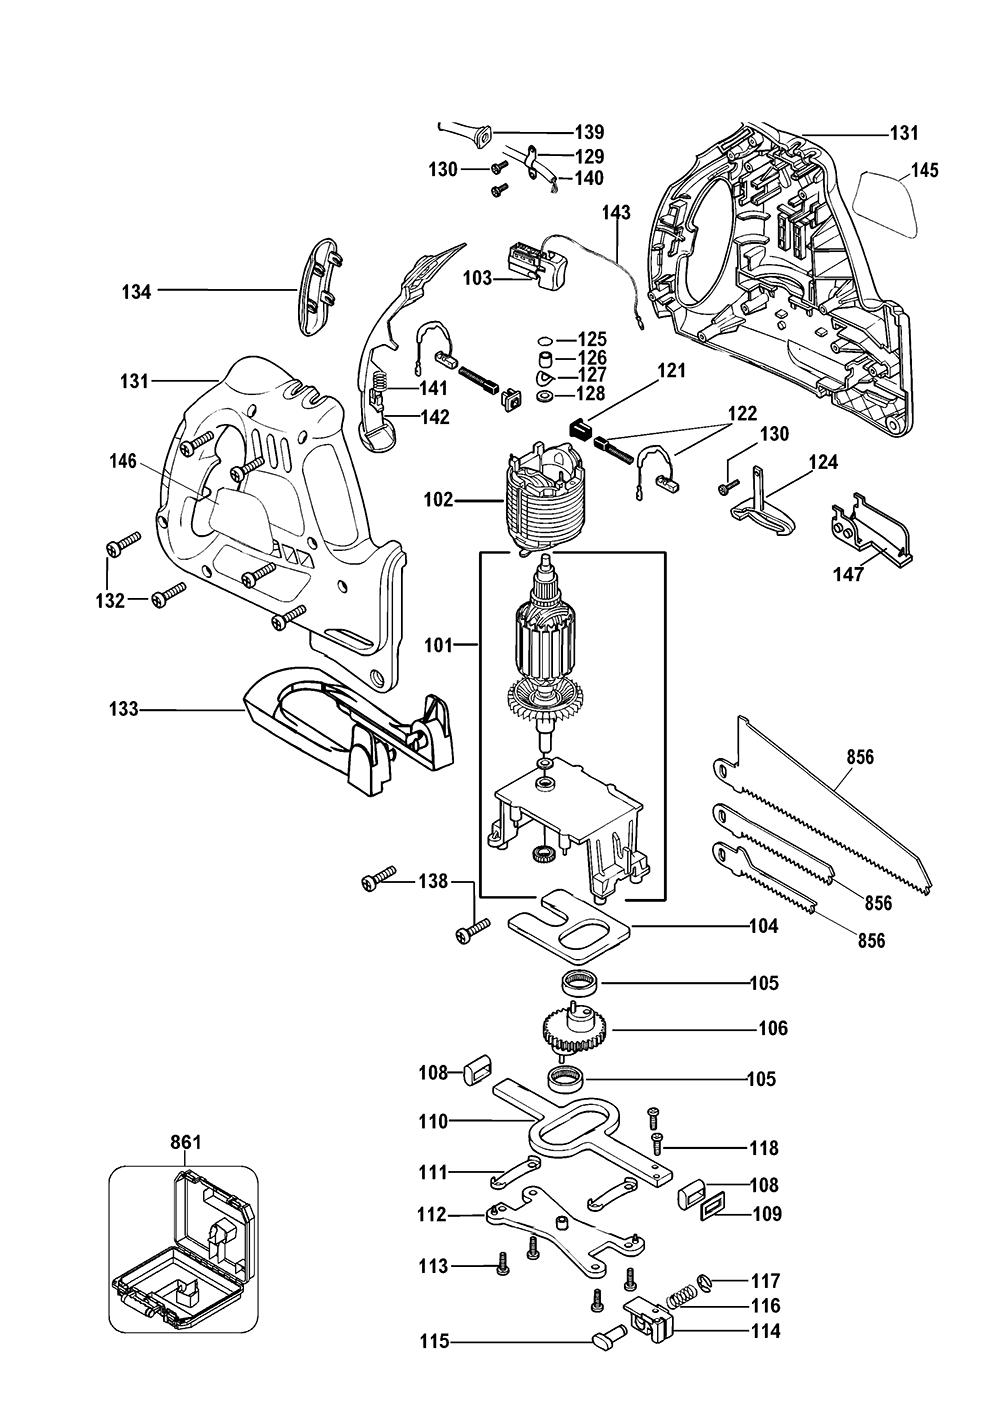 black and decker sc500 manual